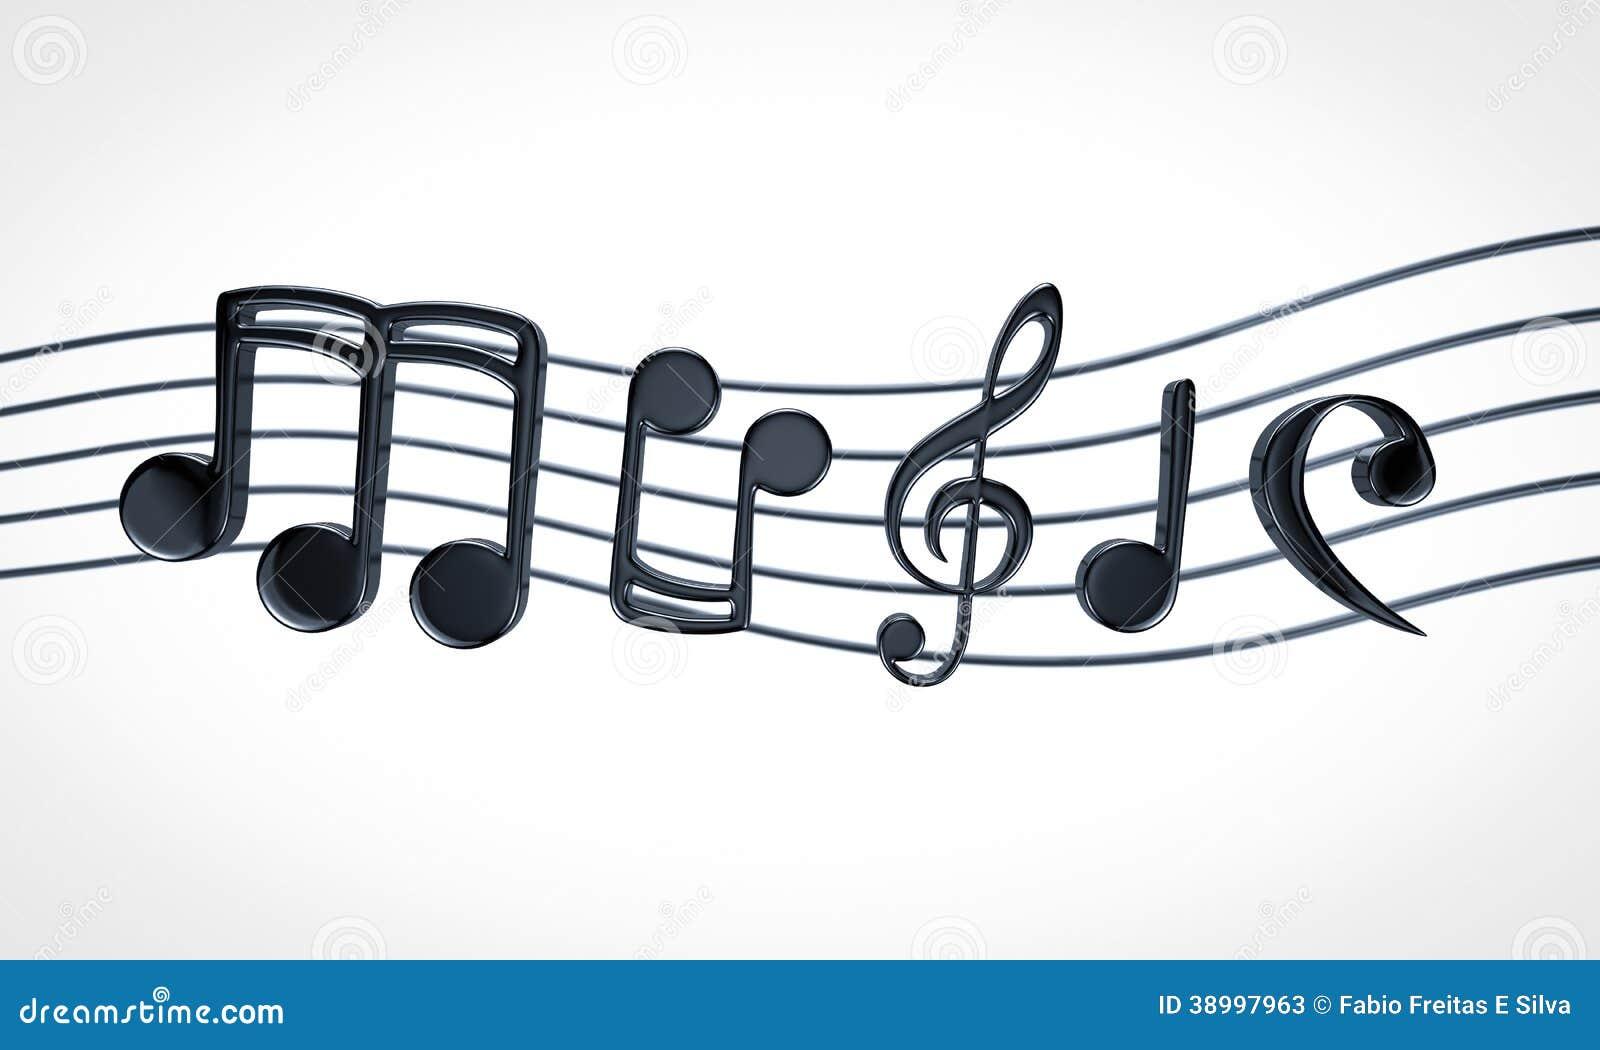 musictext music text pendulum - photo #5